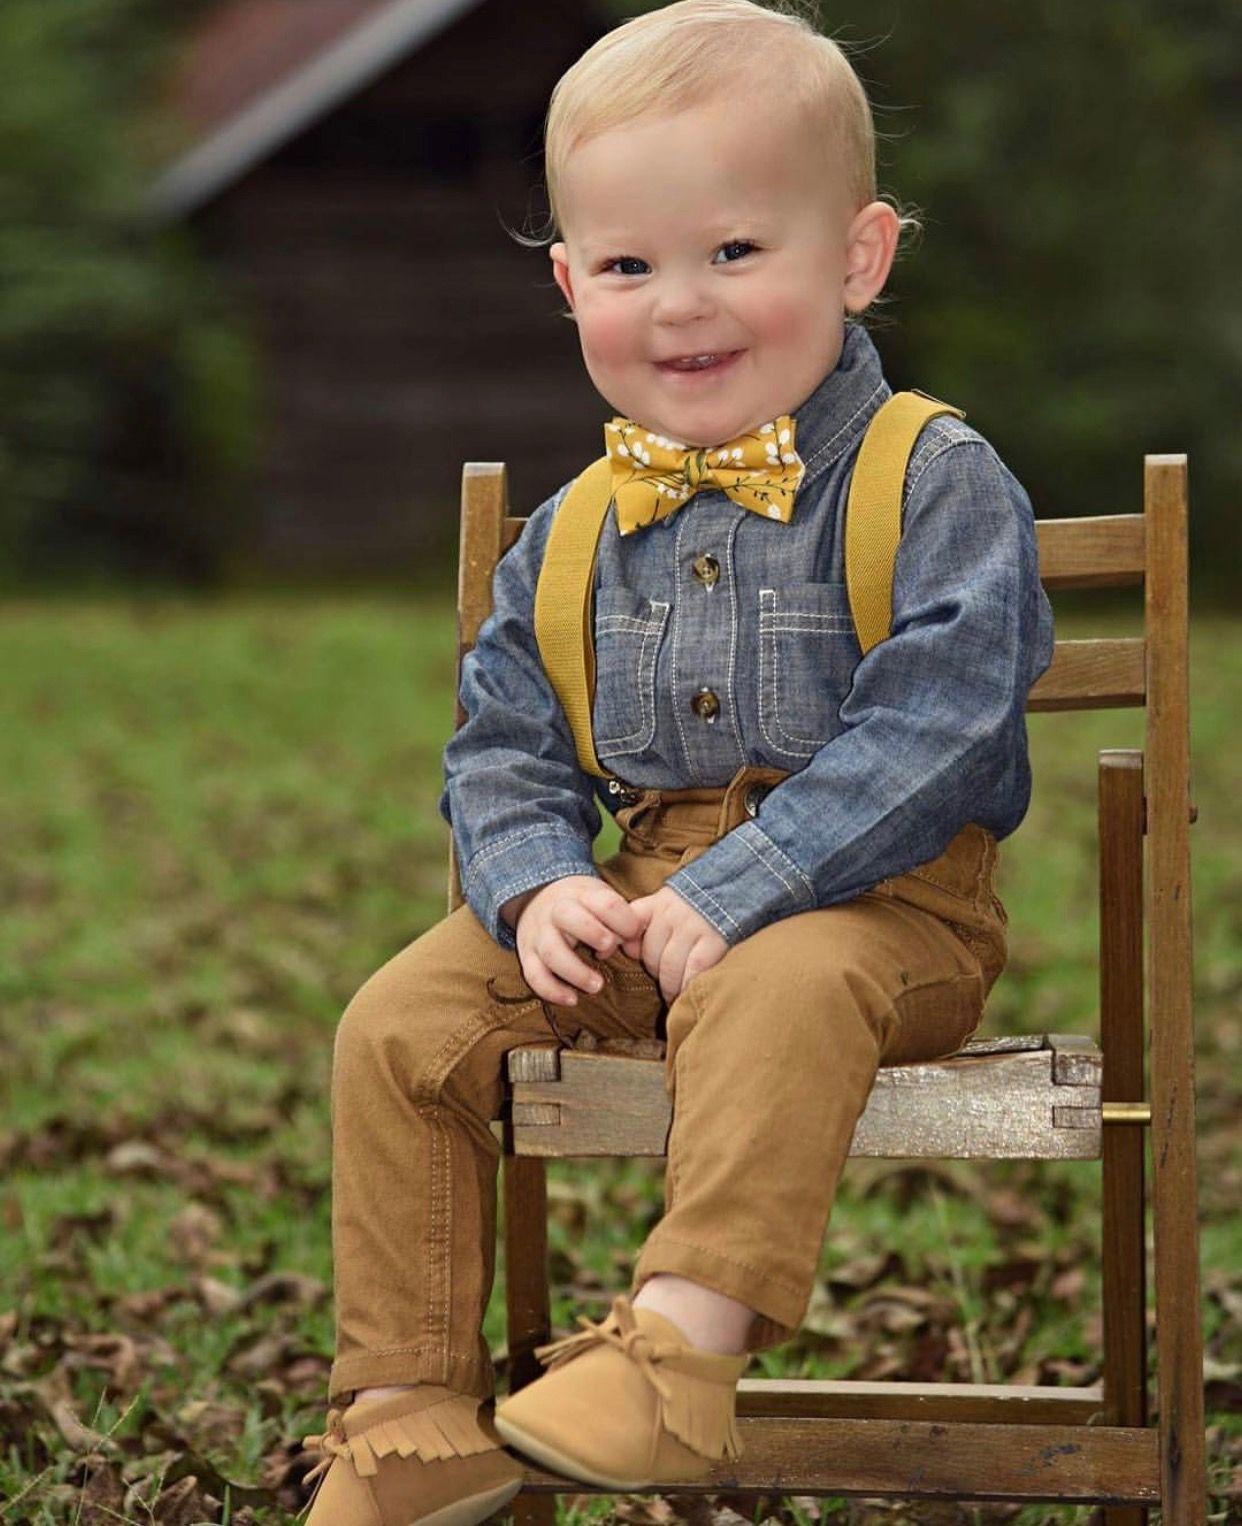 Pin On Little Boy Fashion Inspiration